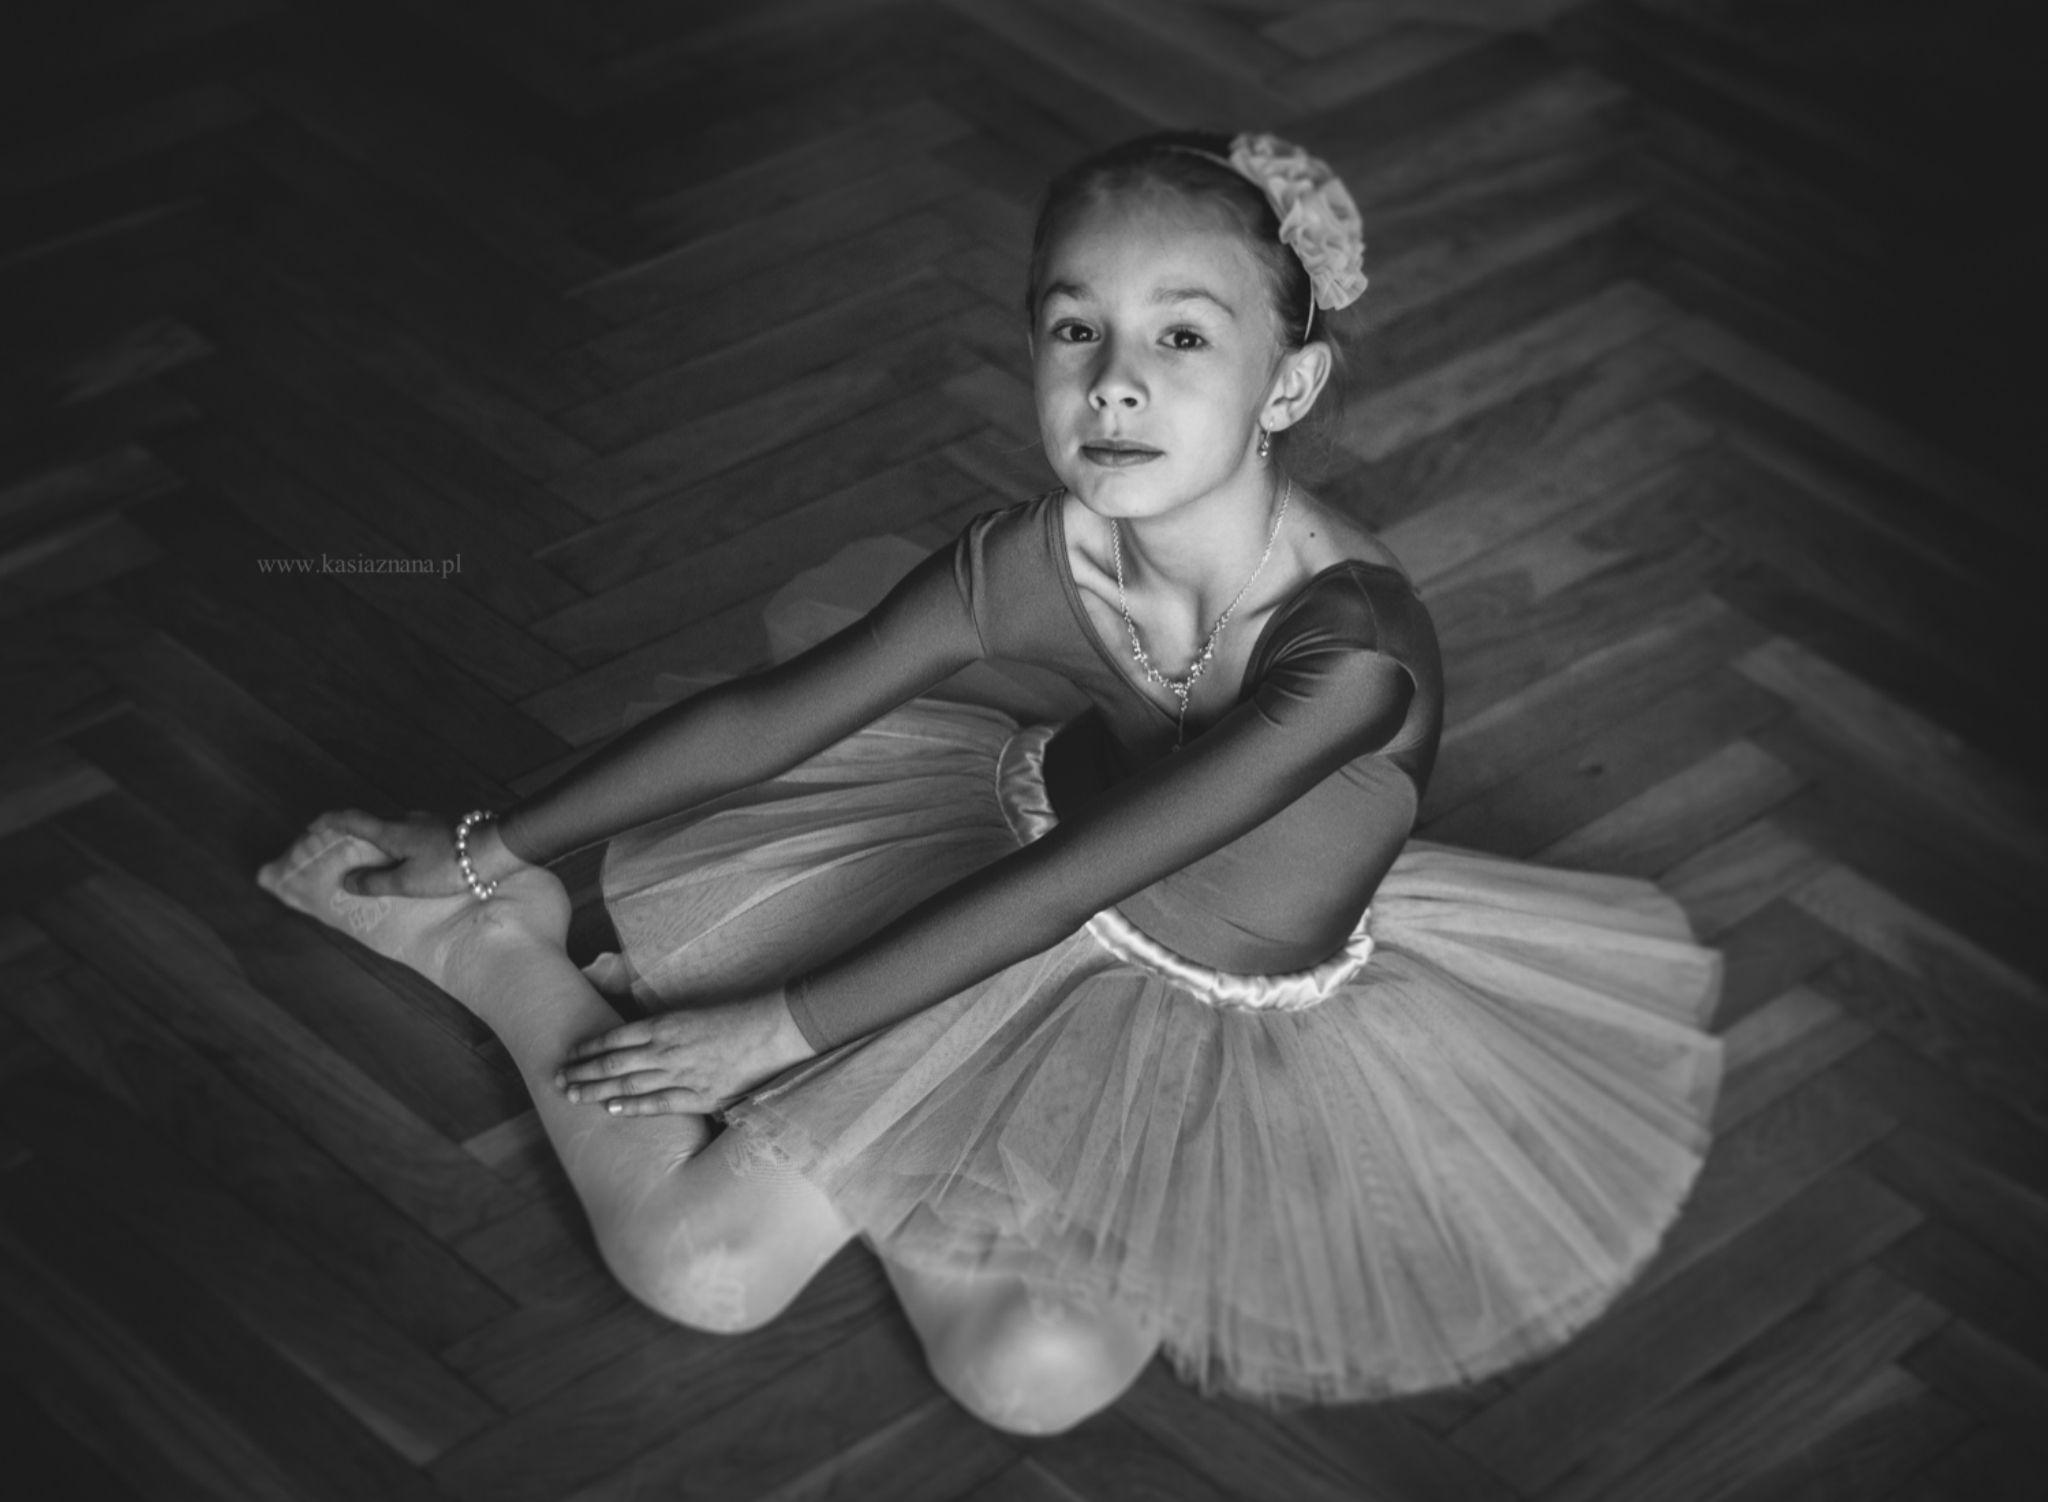 Little ballet dancer by Kasia Znana